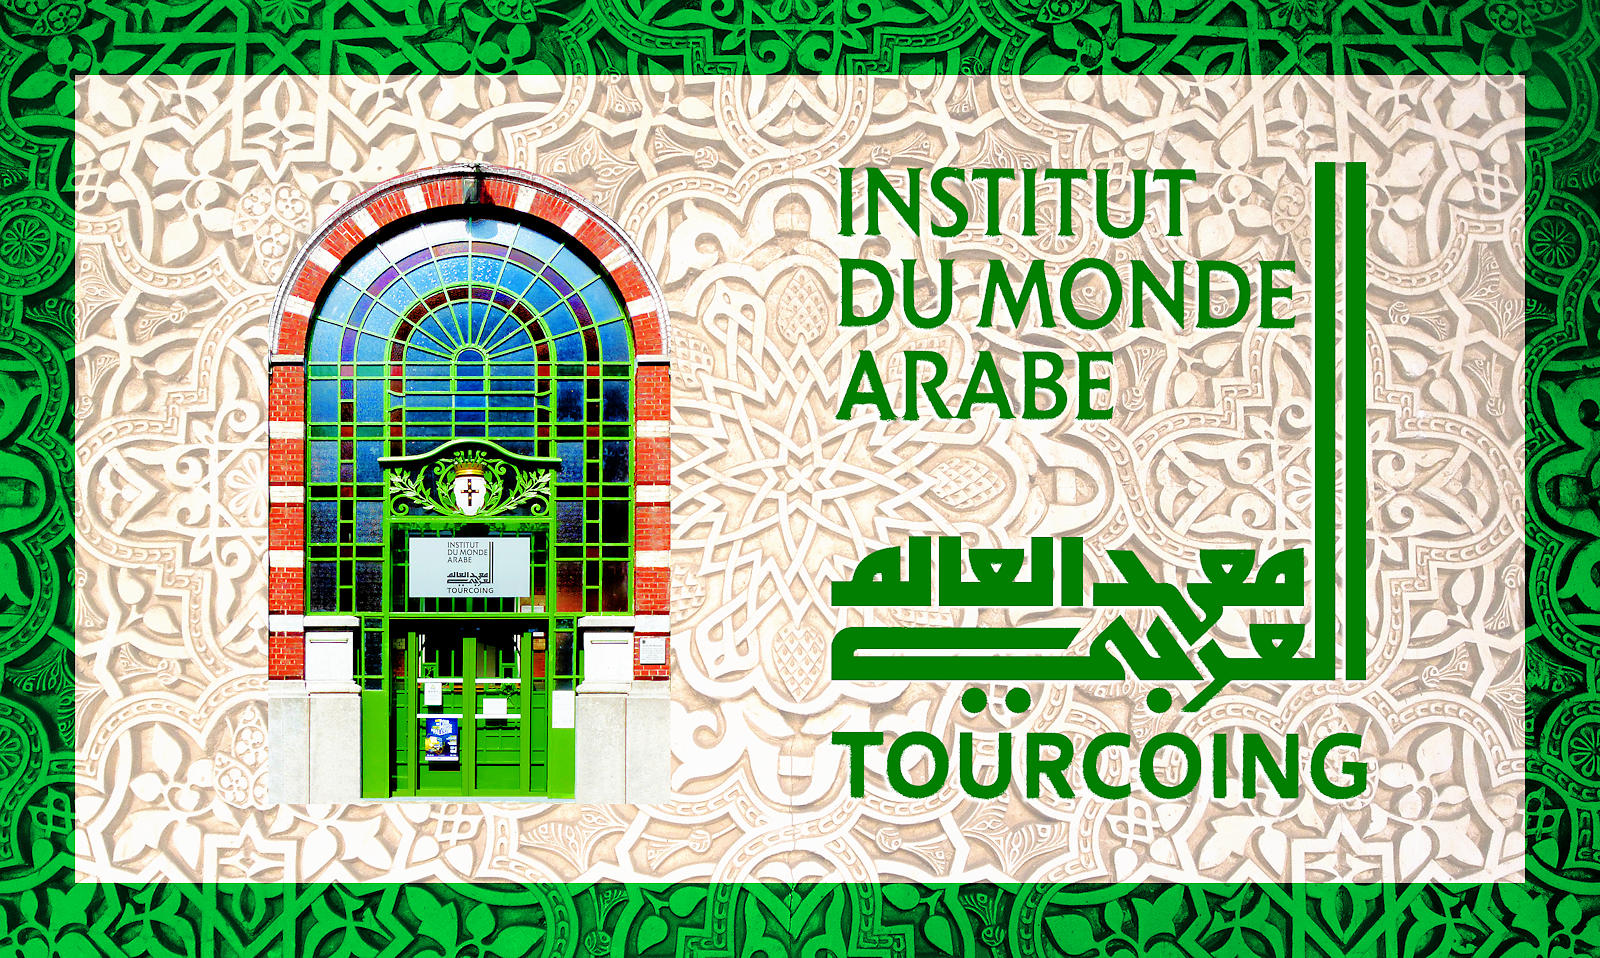 IMA - Institut du Monde Arabe - Tourcoing